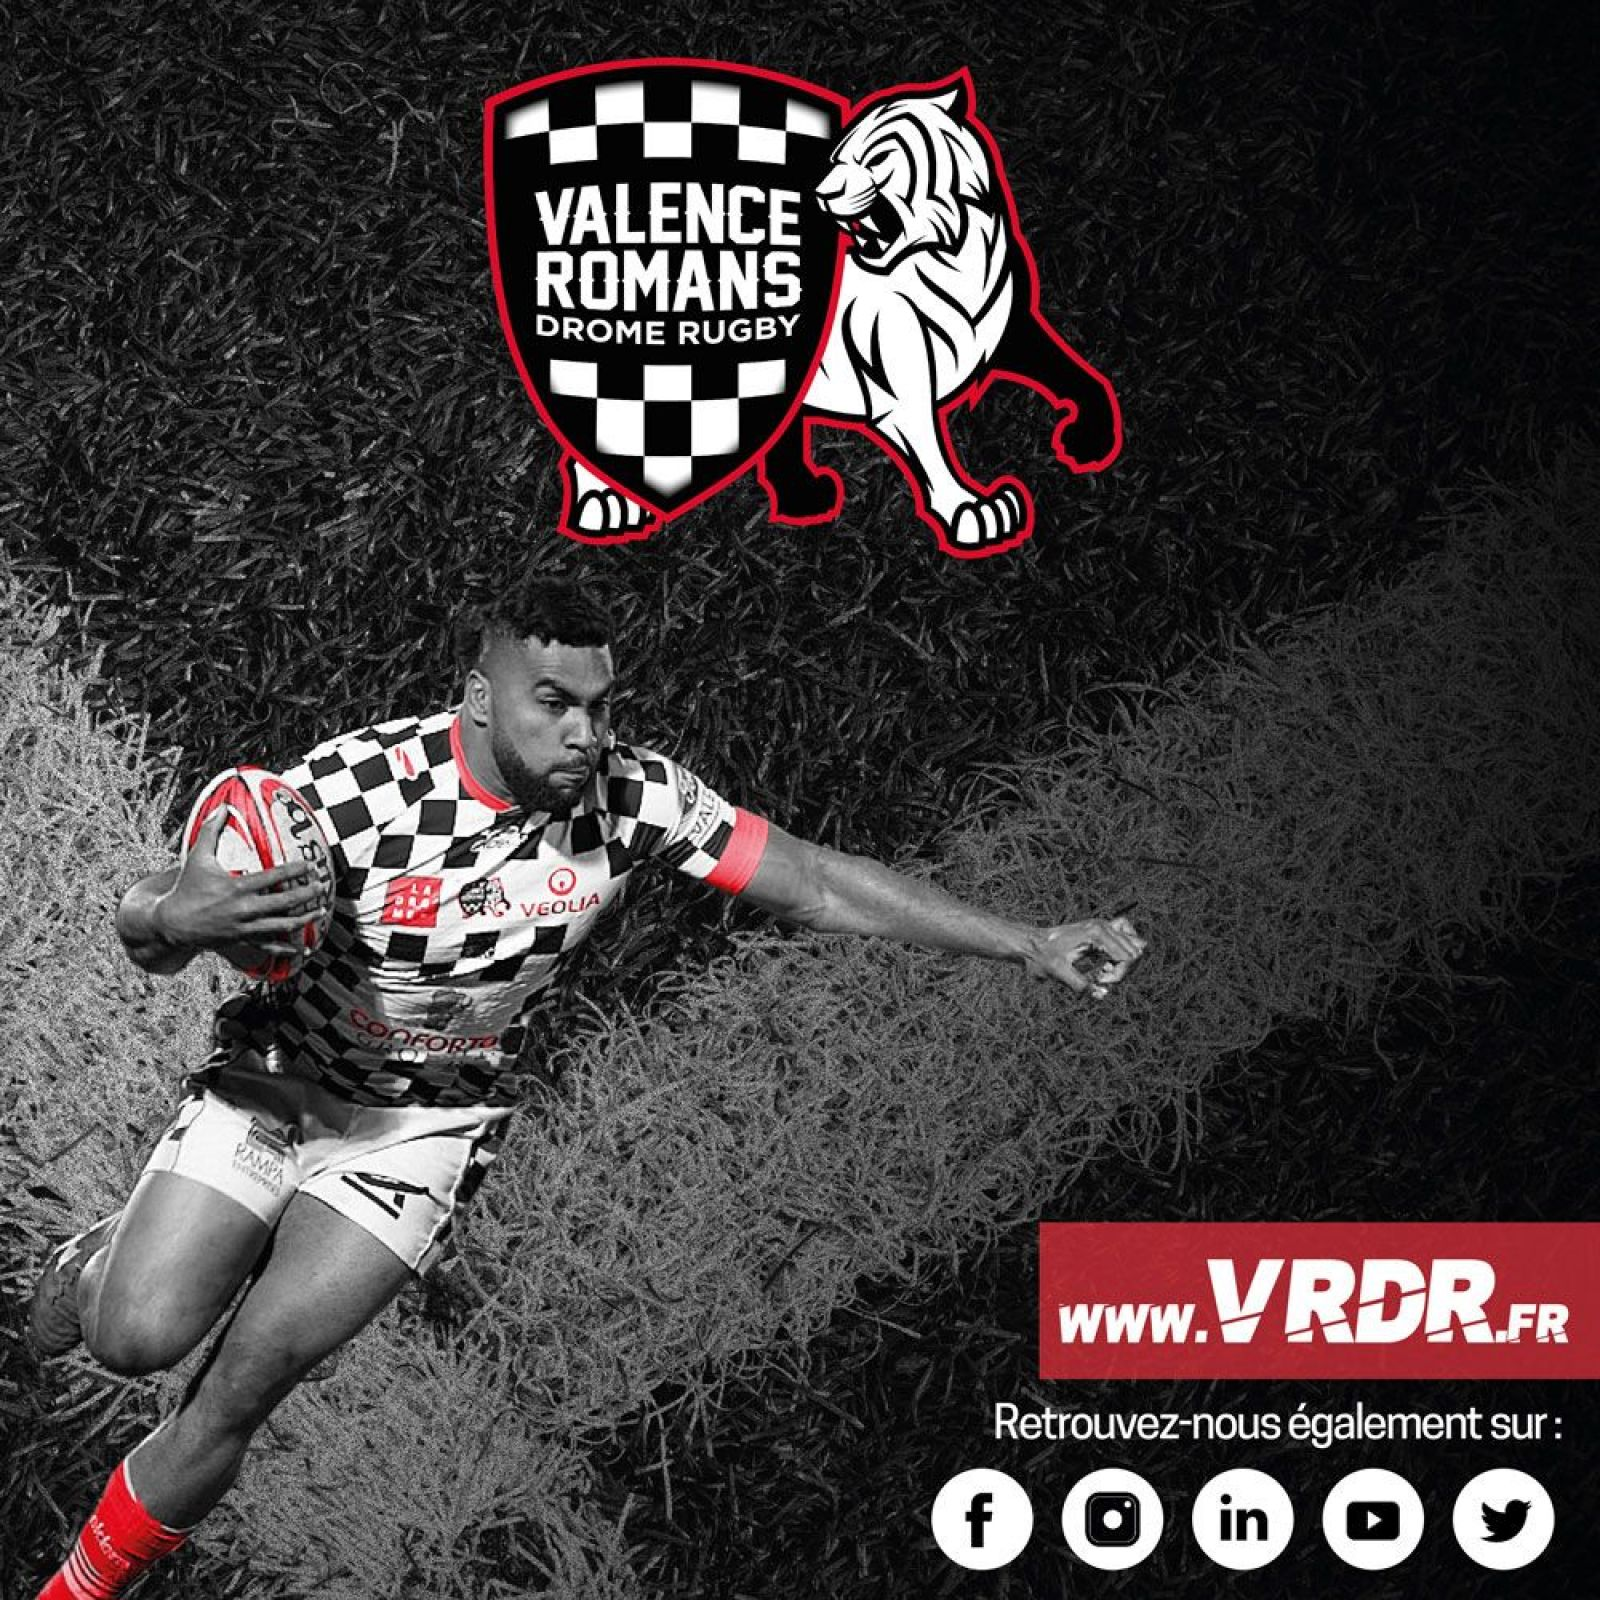 Valence Romans Drôme Rugby